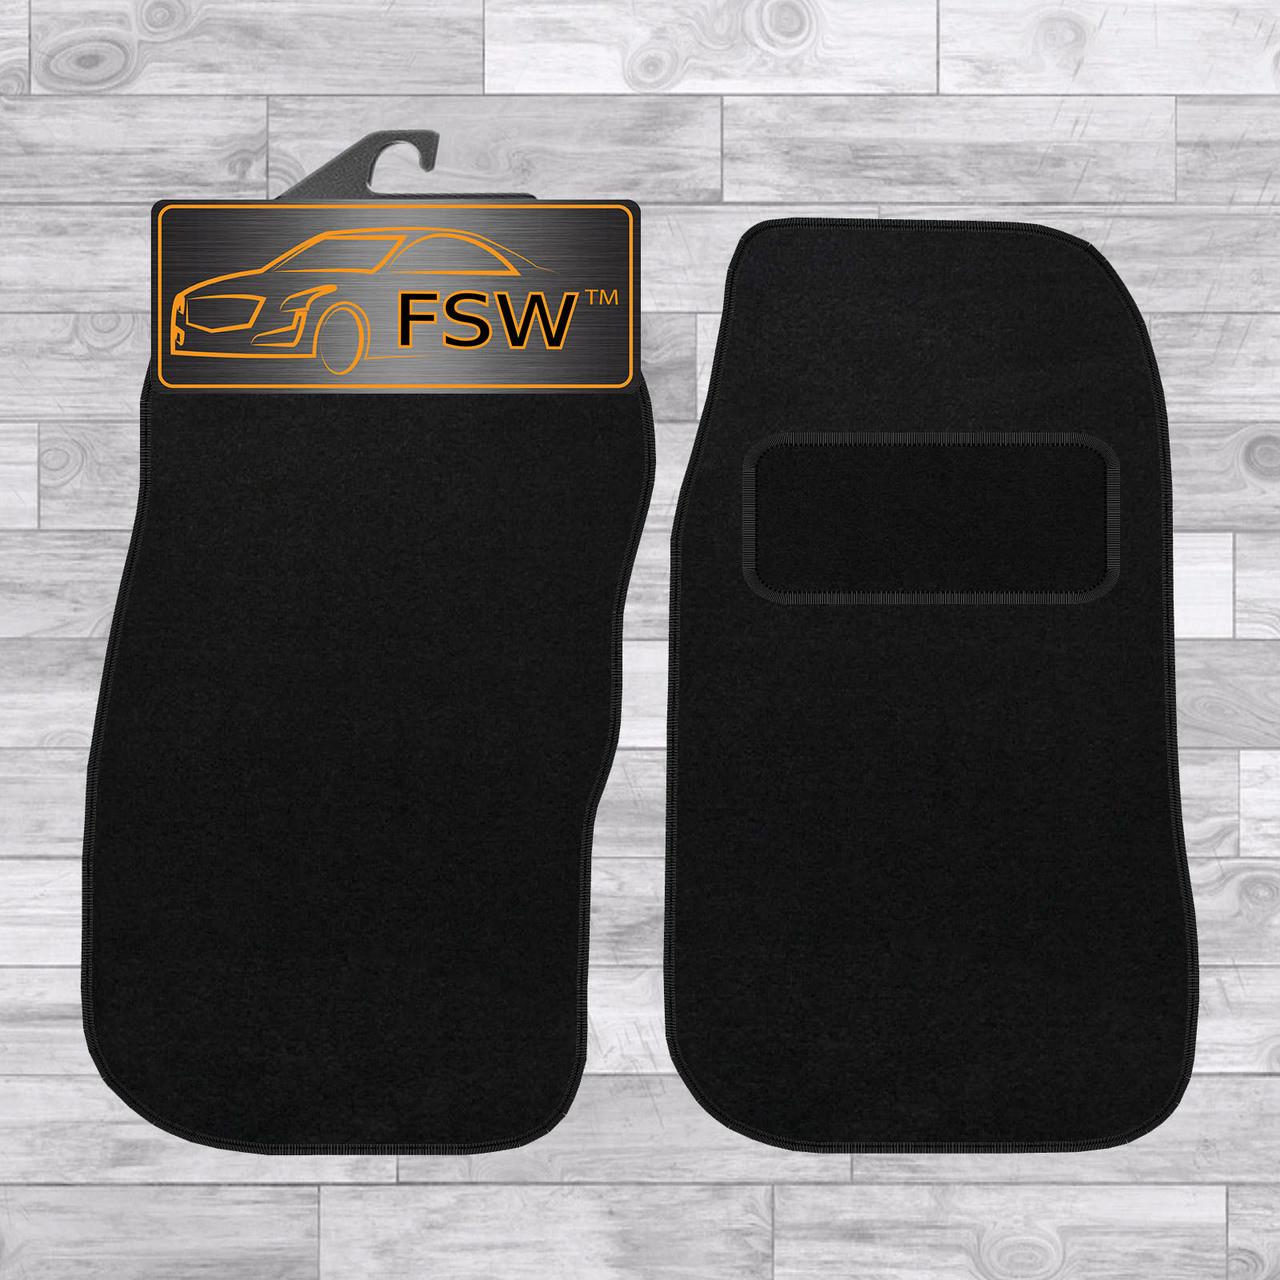 medium resolution of ford transit van 2000 2006 2 piece front tailored classic car floor mats black